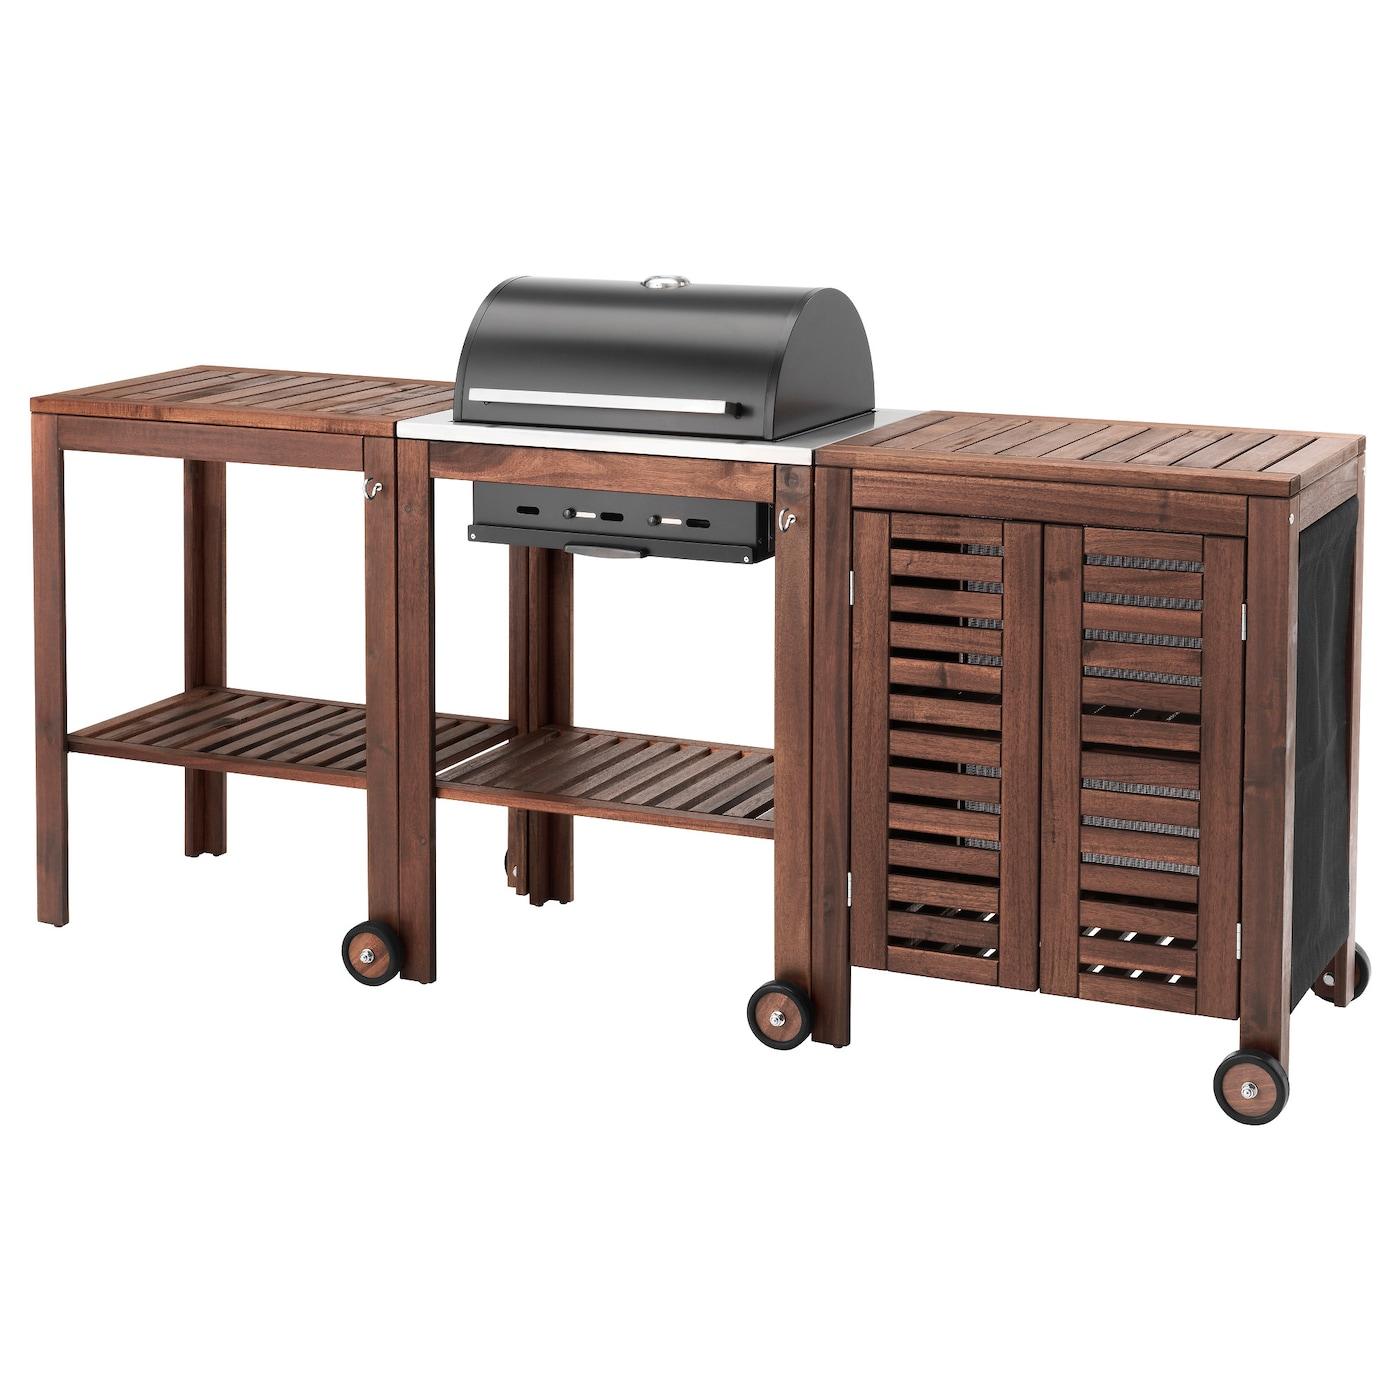 Pplar klasen charcoal barbecue w trolley cabinet brown stained ikea - Ikea tavolino esterno ...